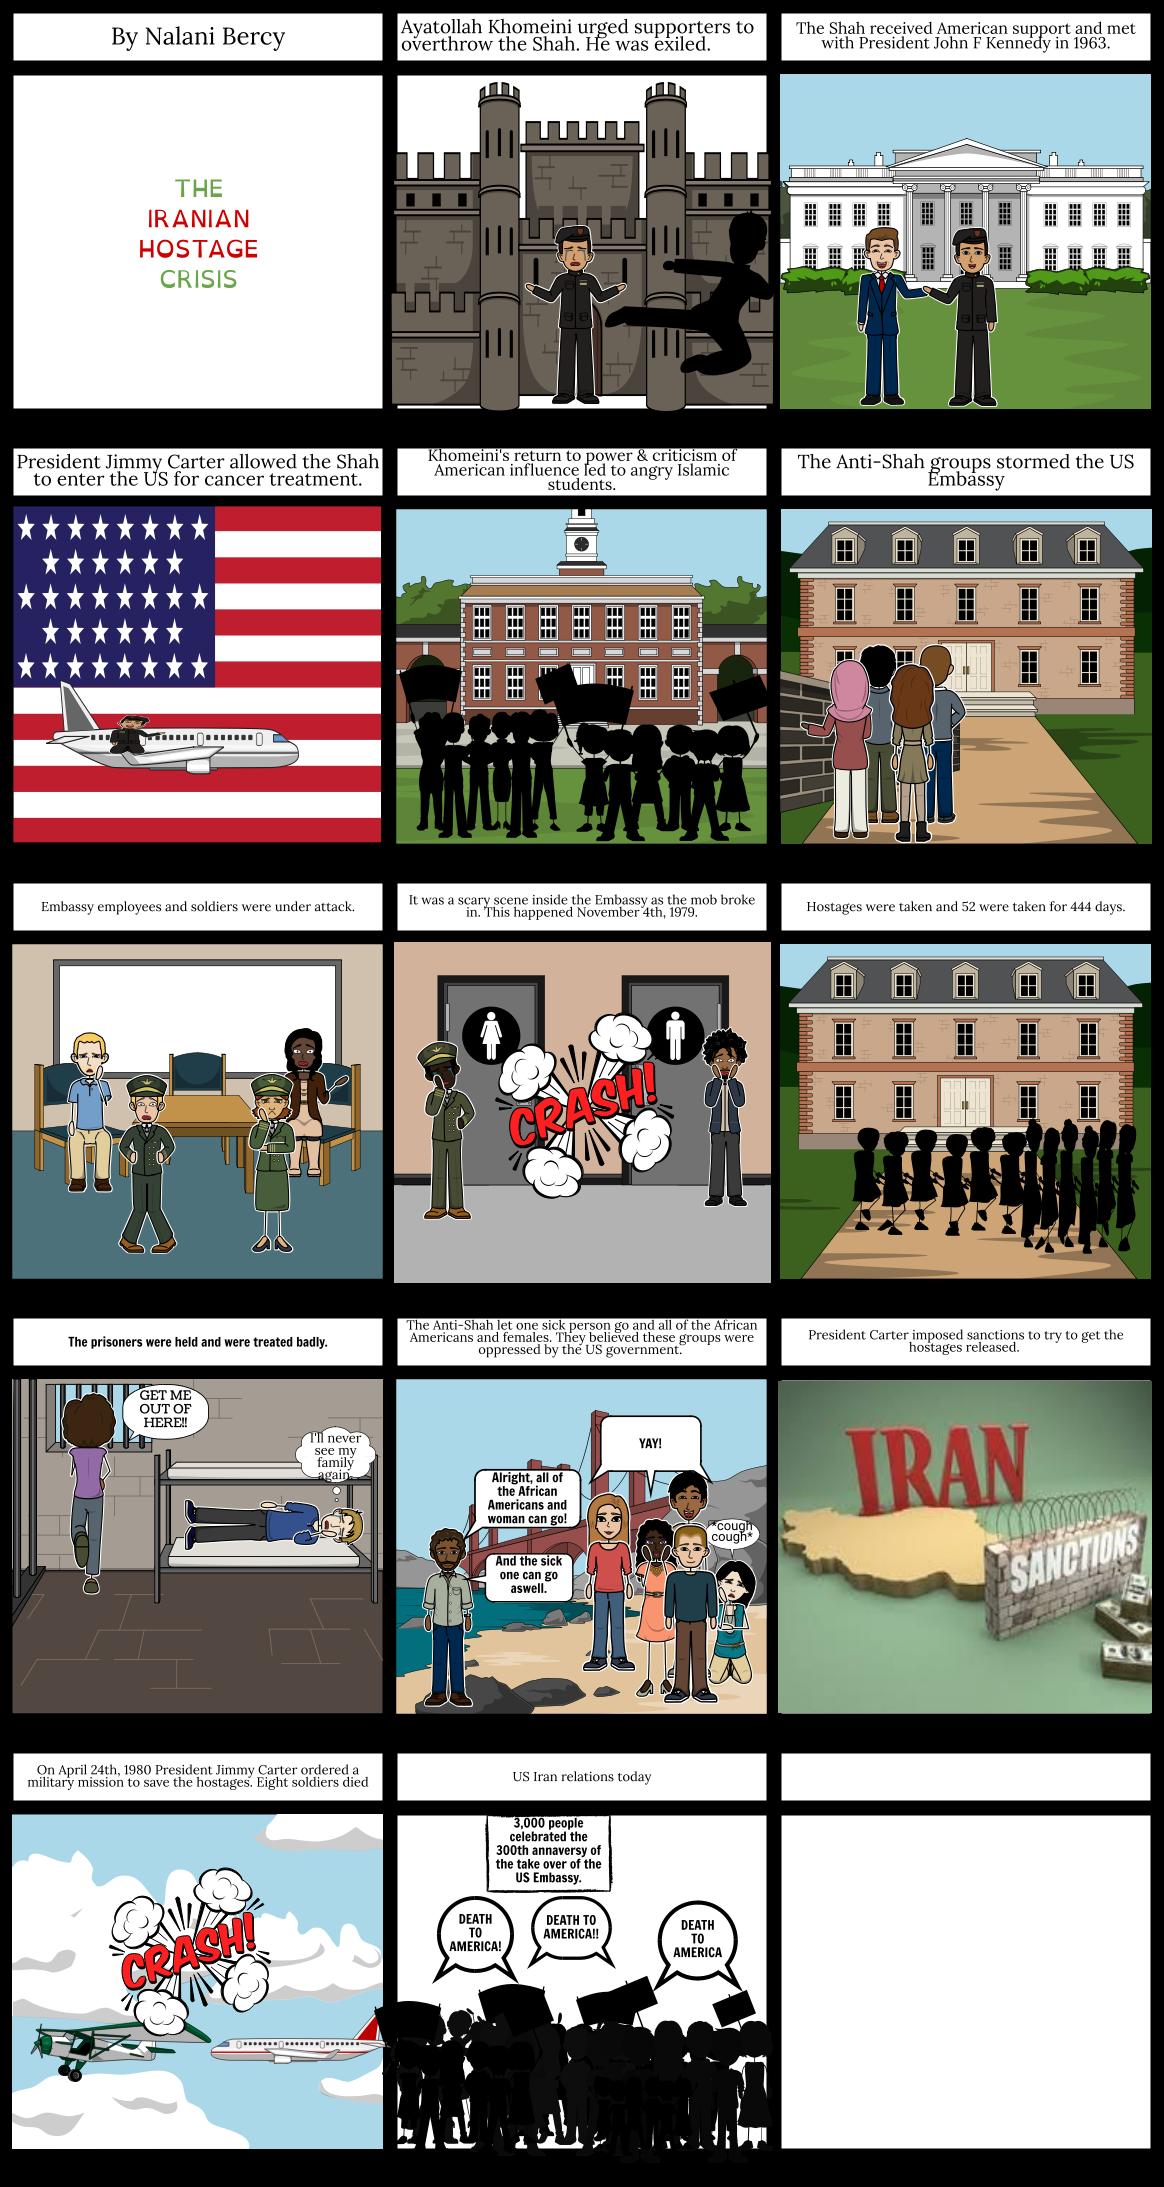 The Iranin Hostage Crisis